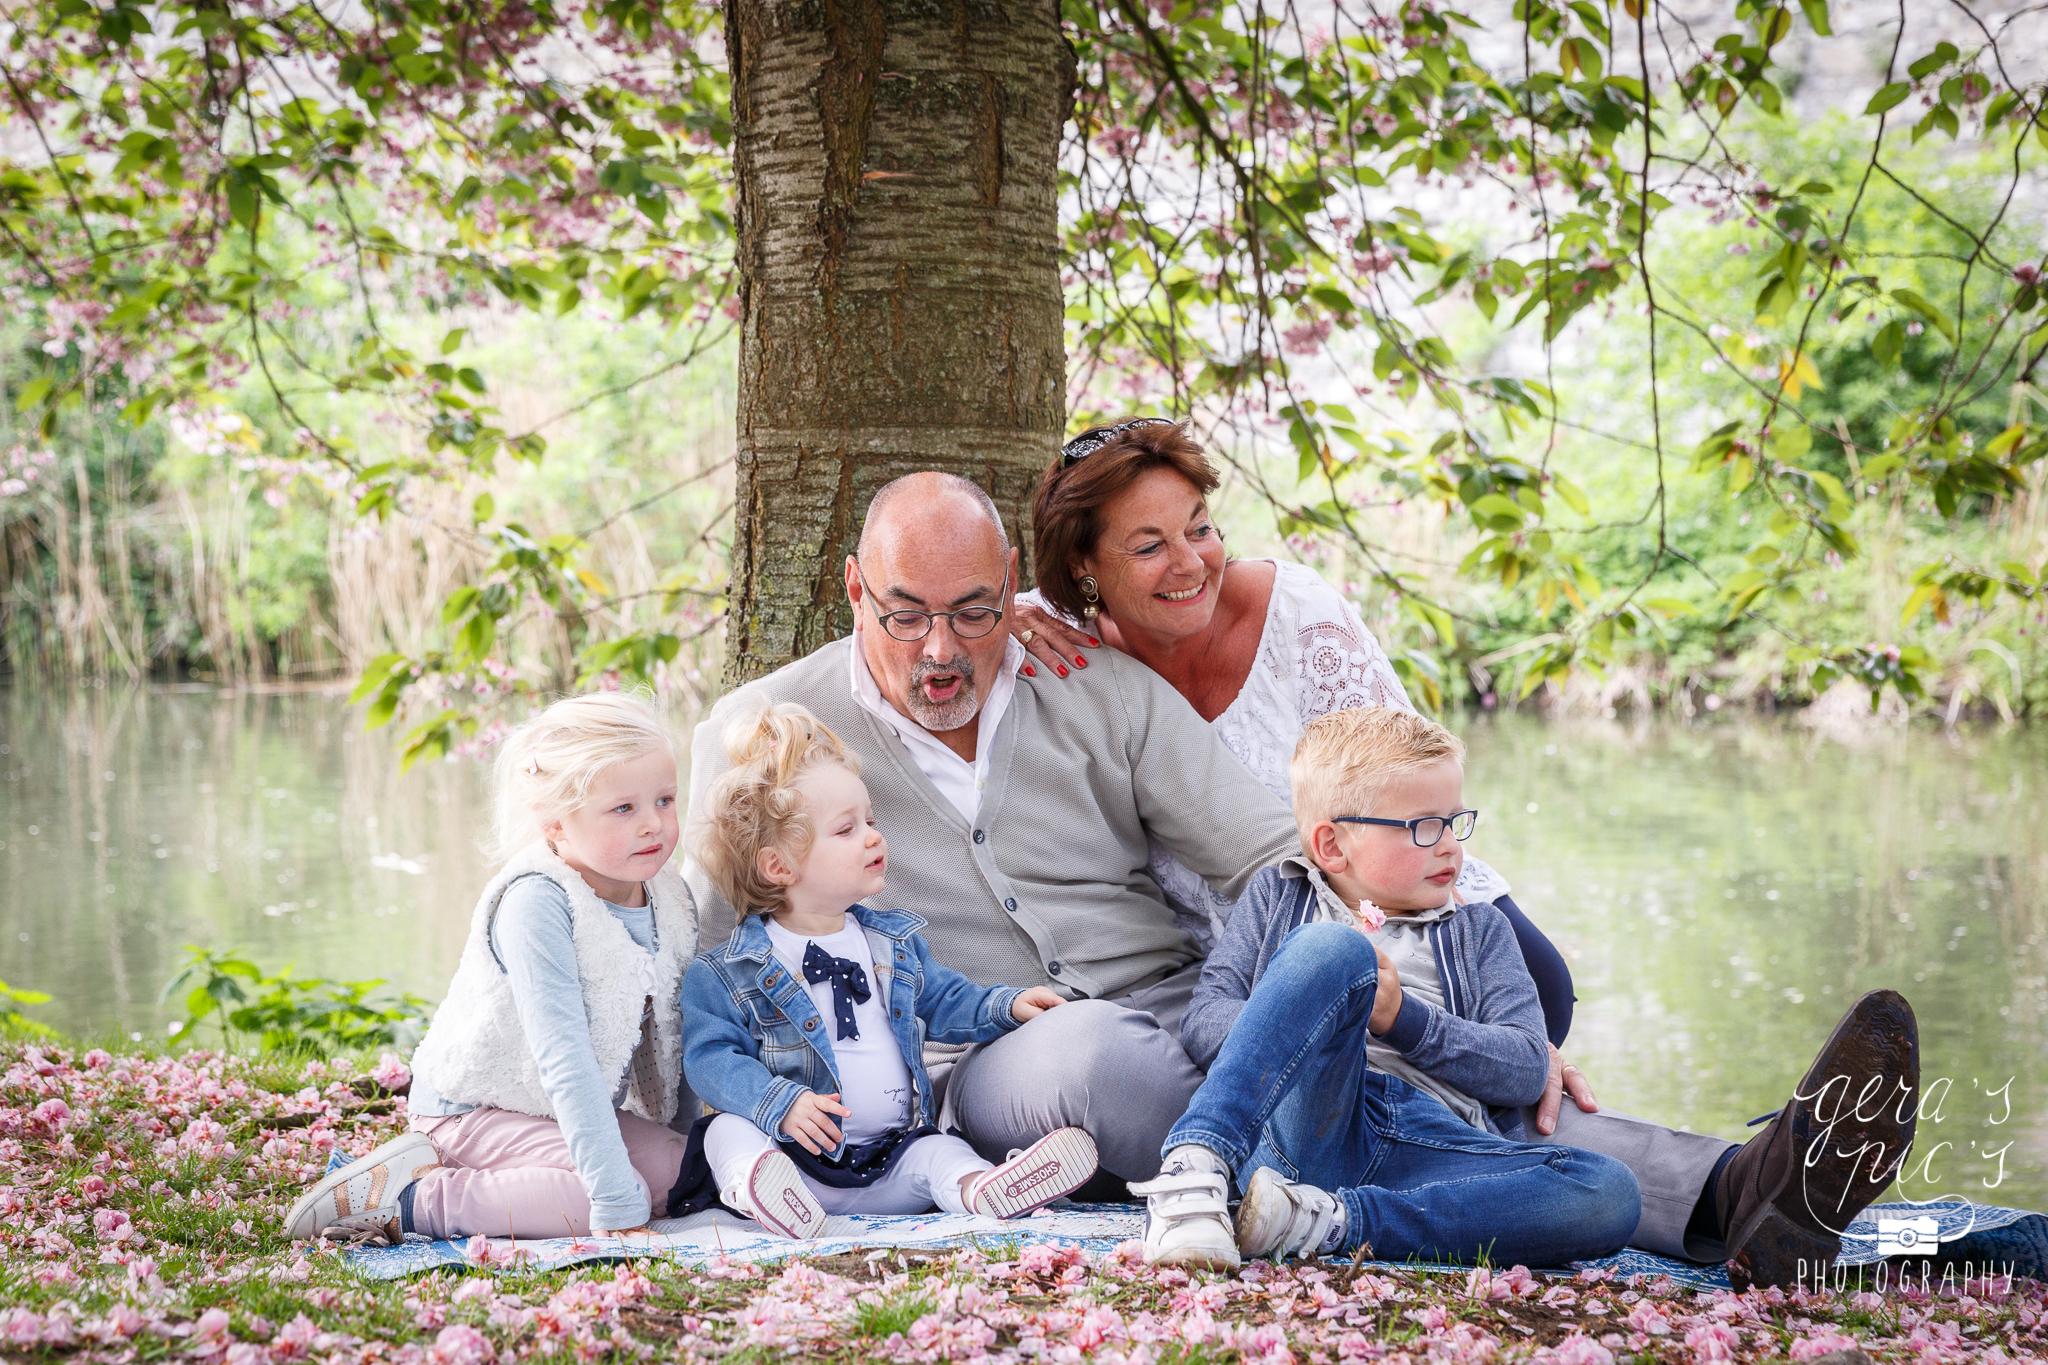 Maastricht Familyshoot Gera's Pic's Photography-3